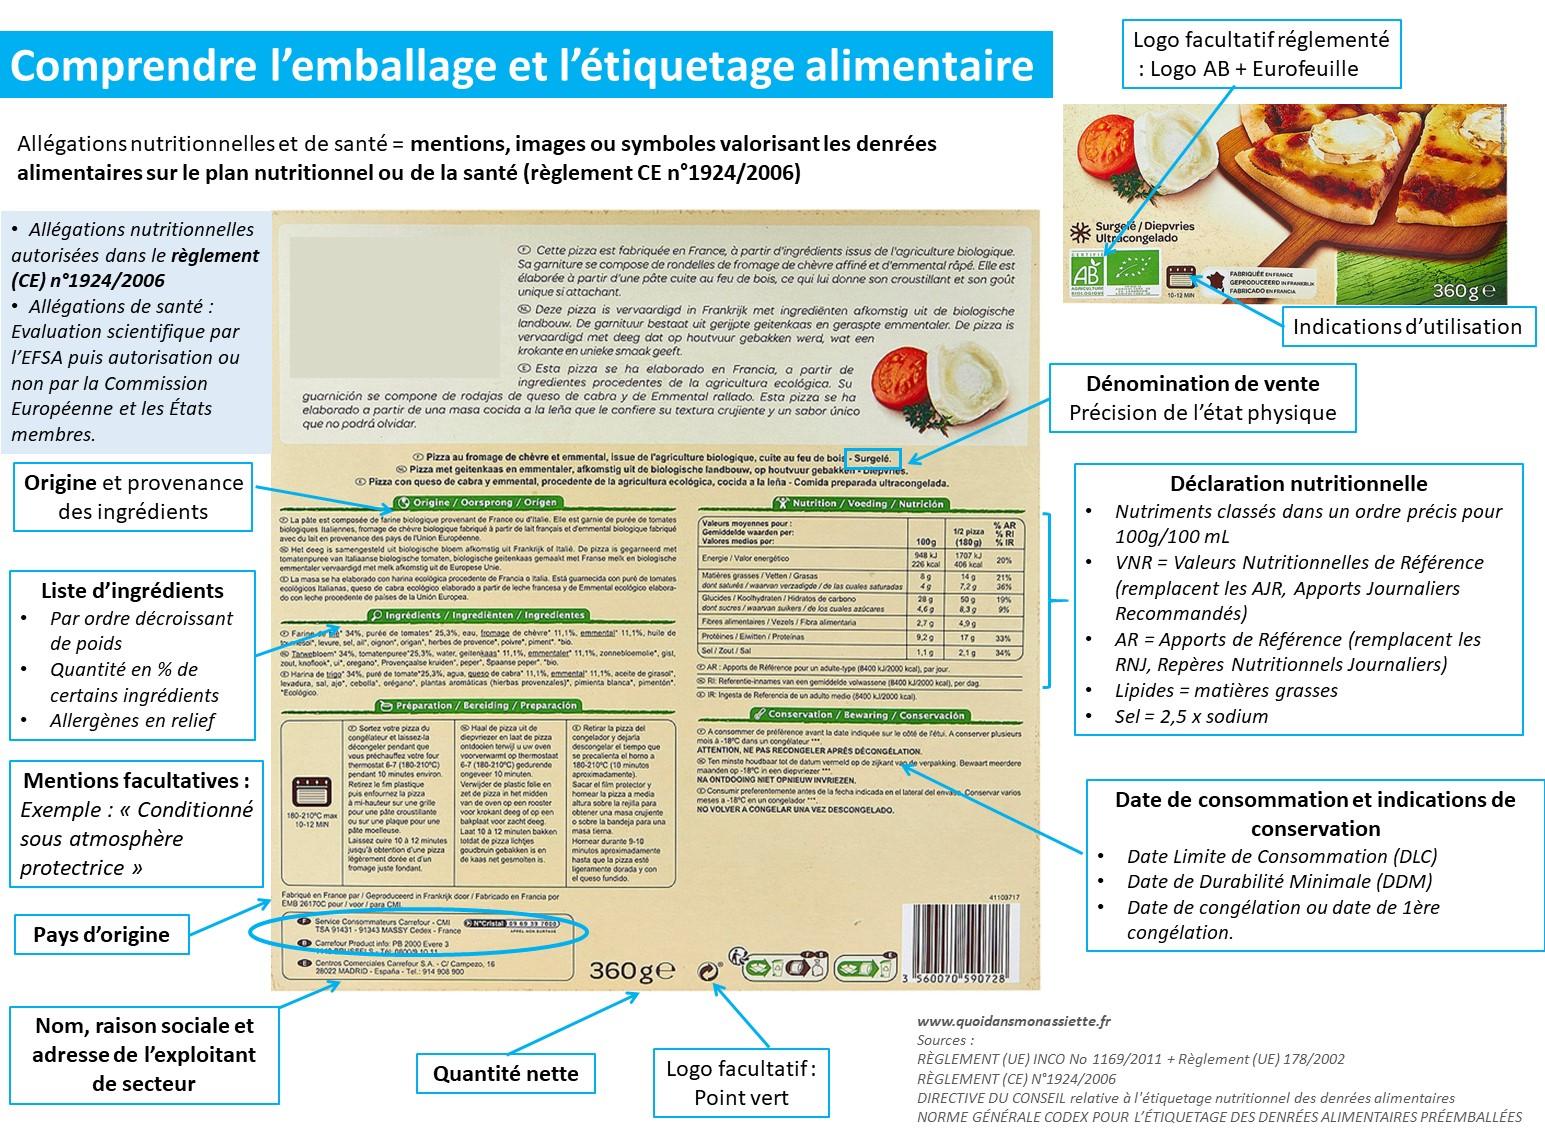 etiquetage nutritionnel déclaration liste ingredient emballage infographie 2